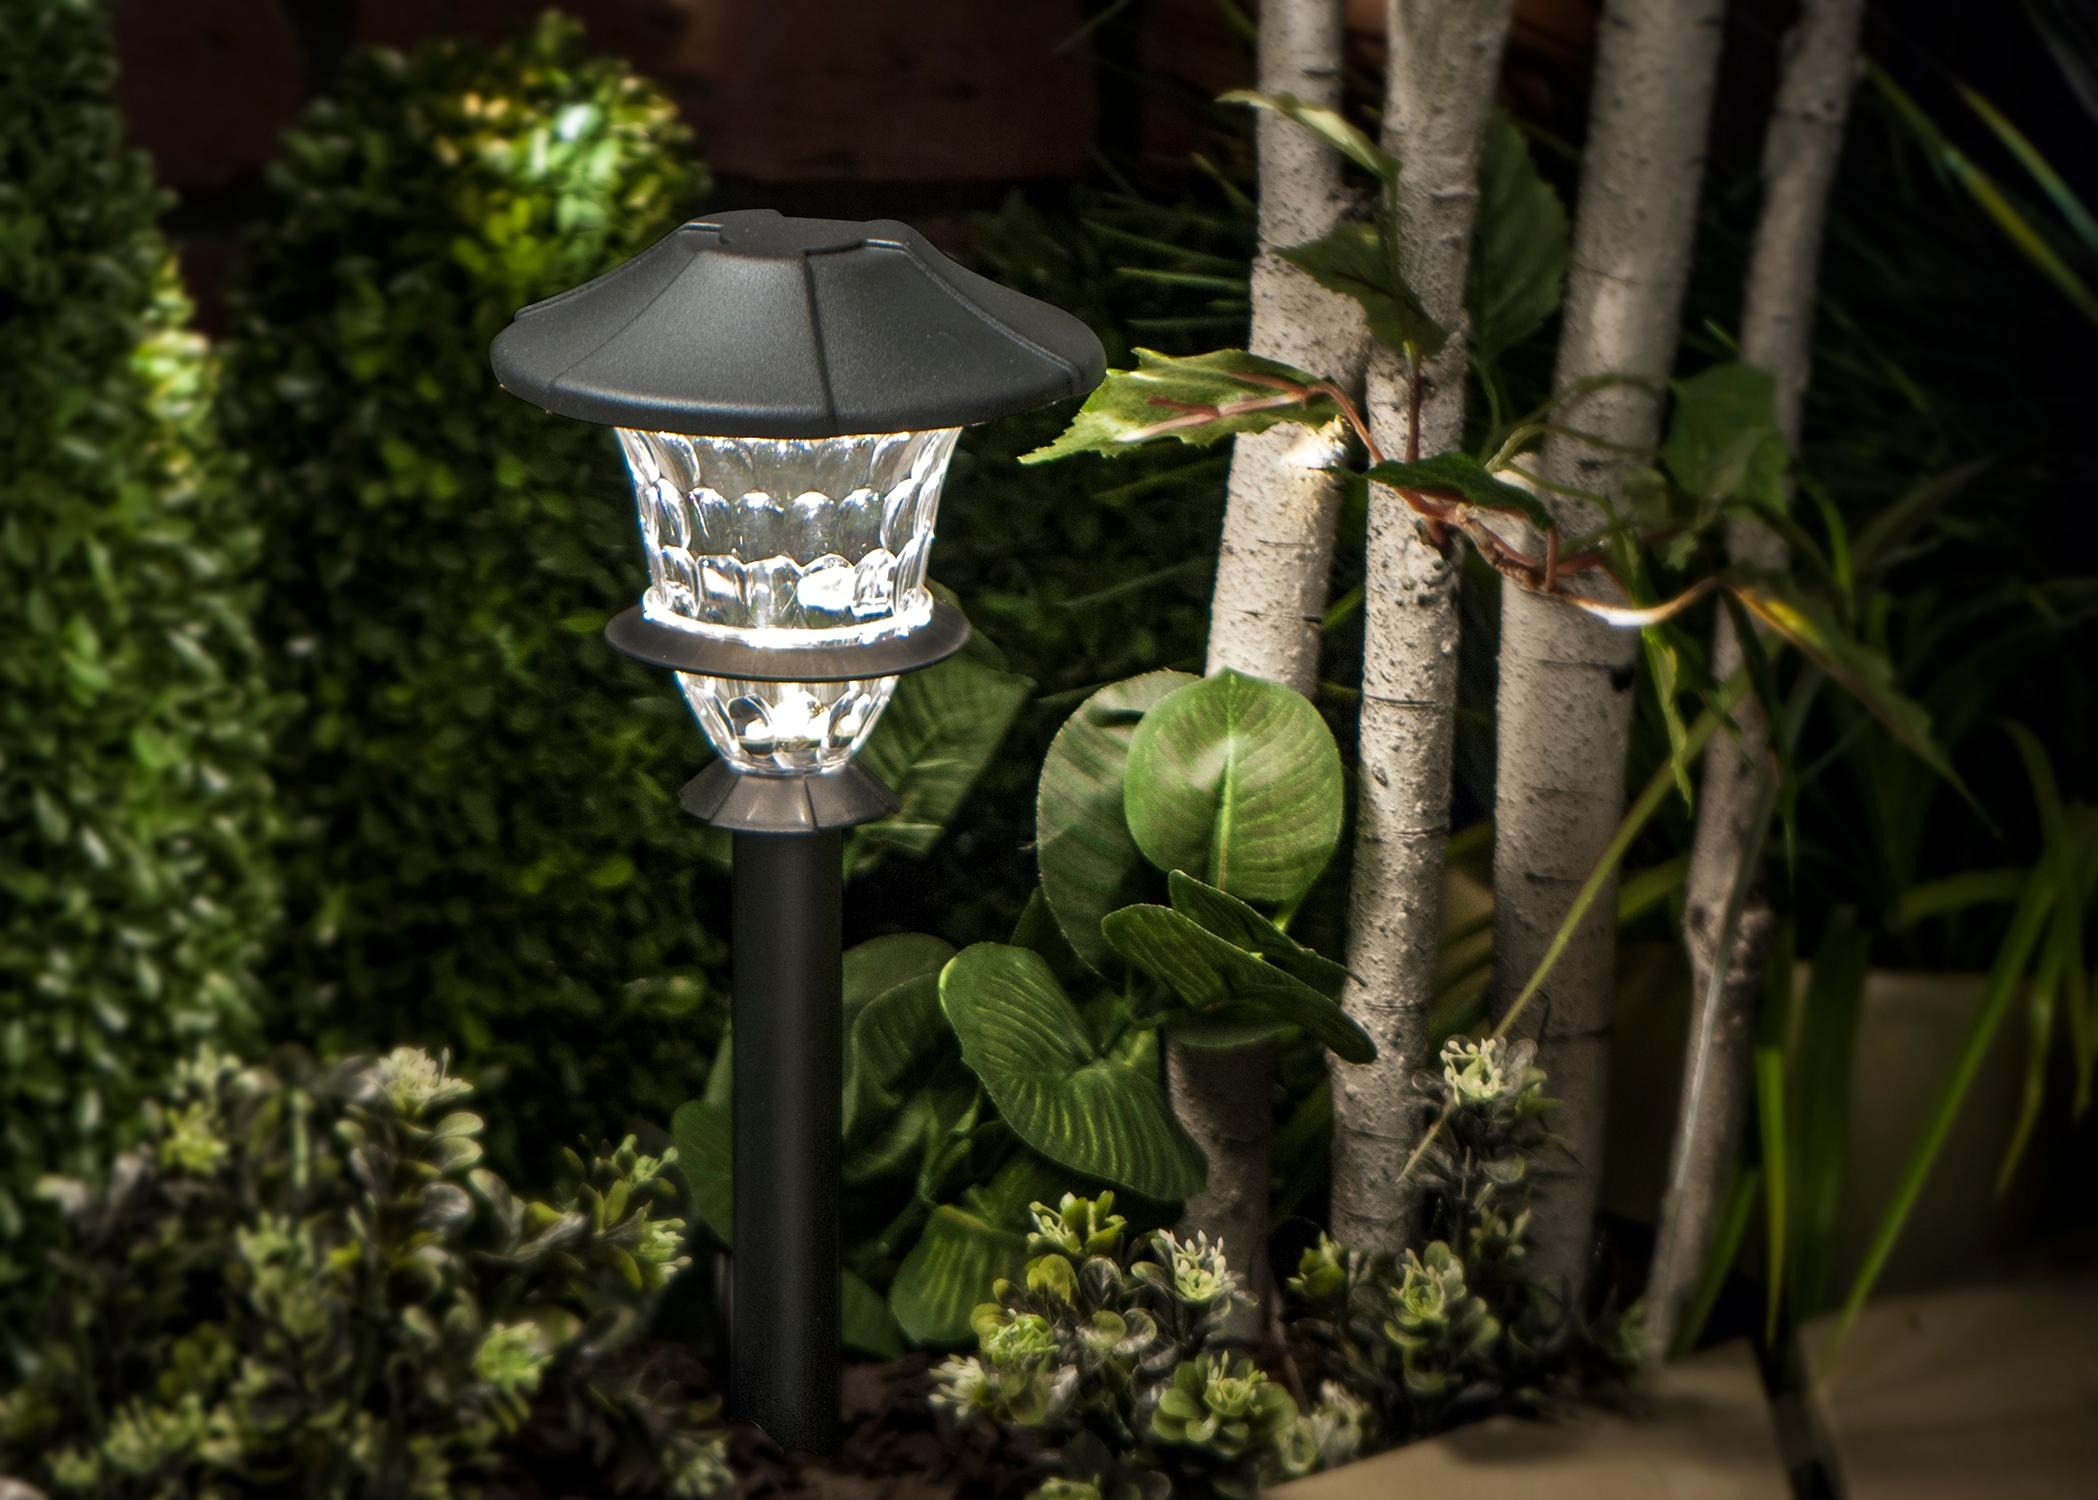 Paradise Led Low Voltage Landscape Lighting : Paradise gl bk low voltage aluminum led path light